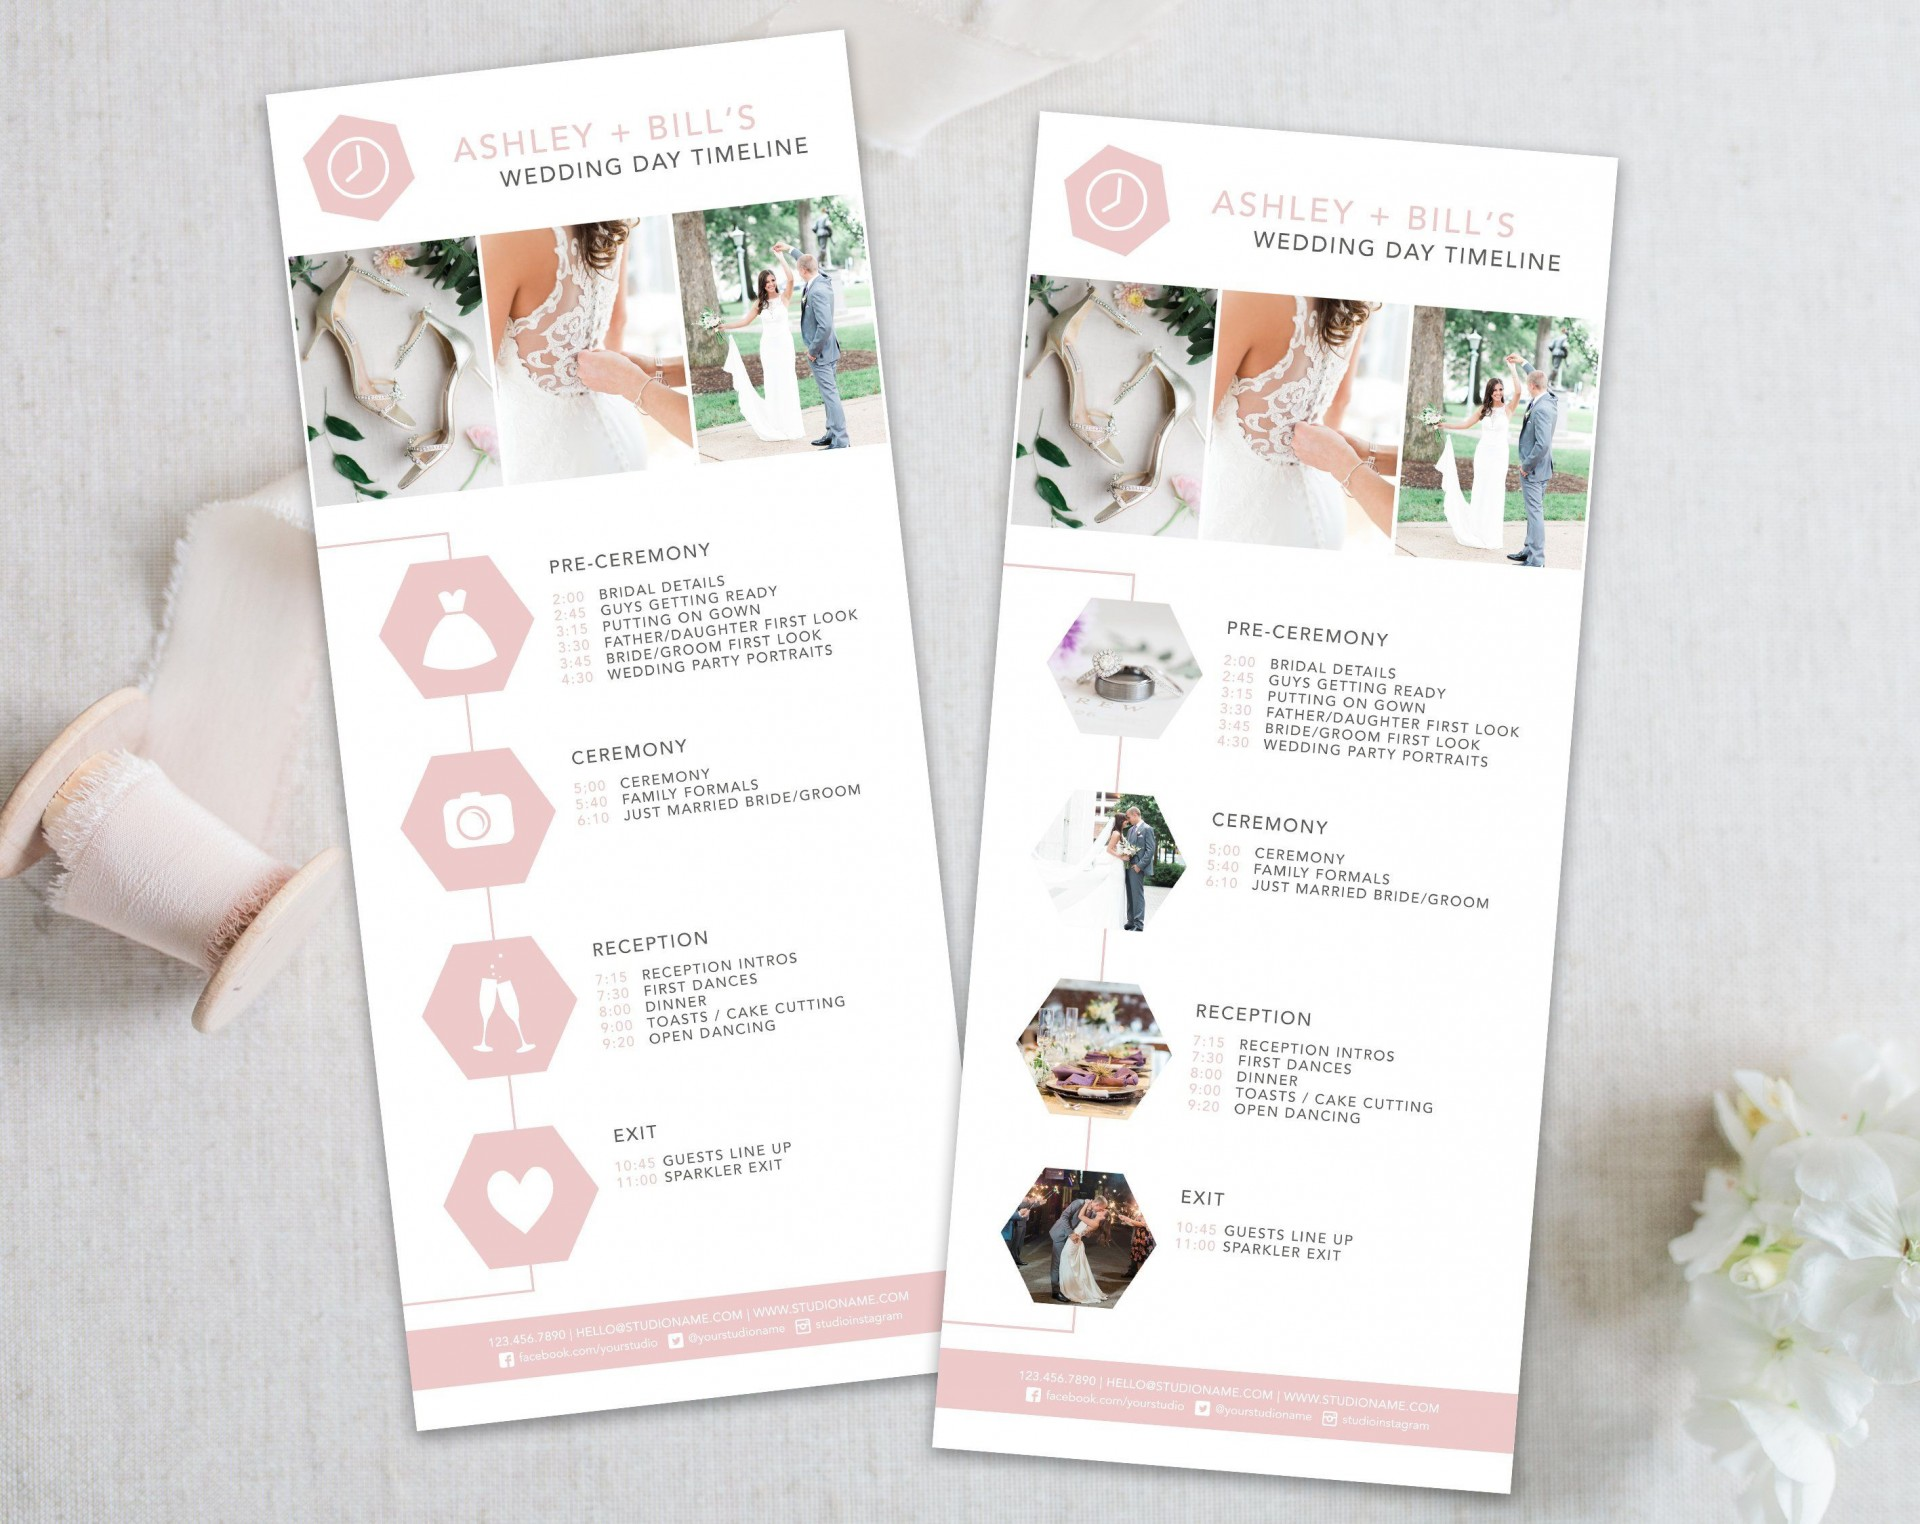 003 Unique Wedding Timeline Template Free Download Photo 1920